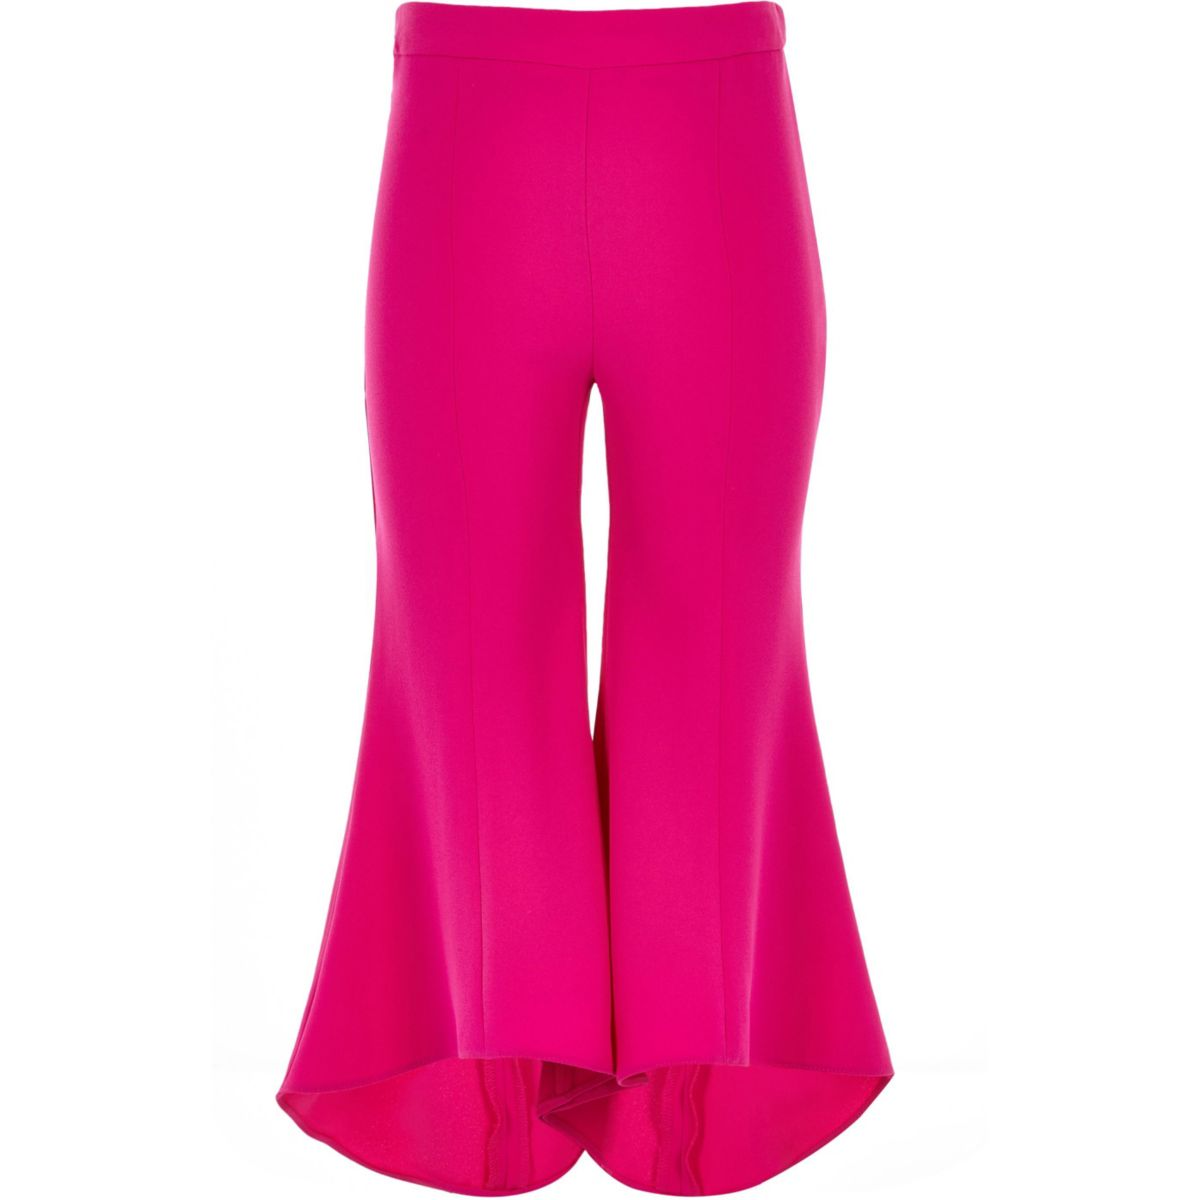 RI Studio – Pantalon évasé rose vif pour fille